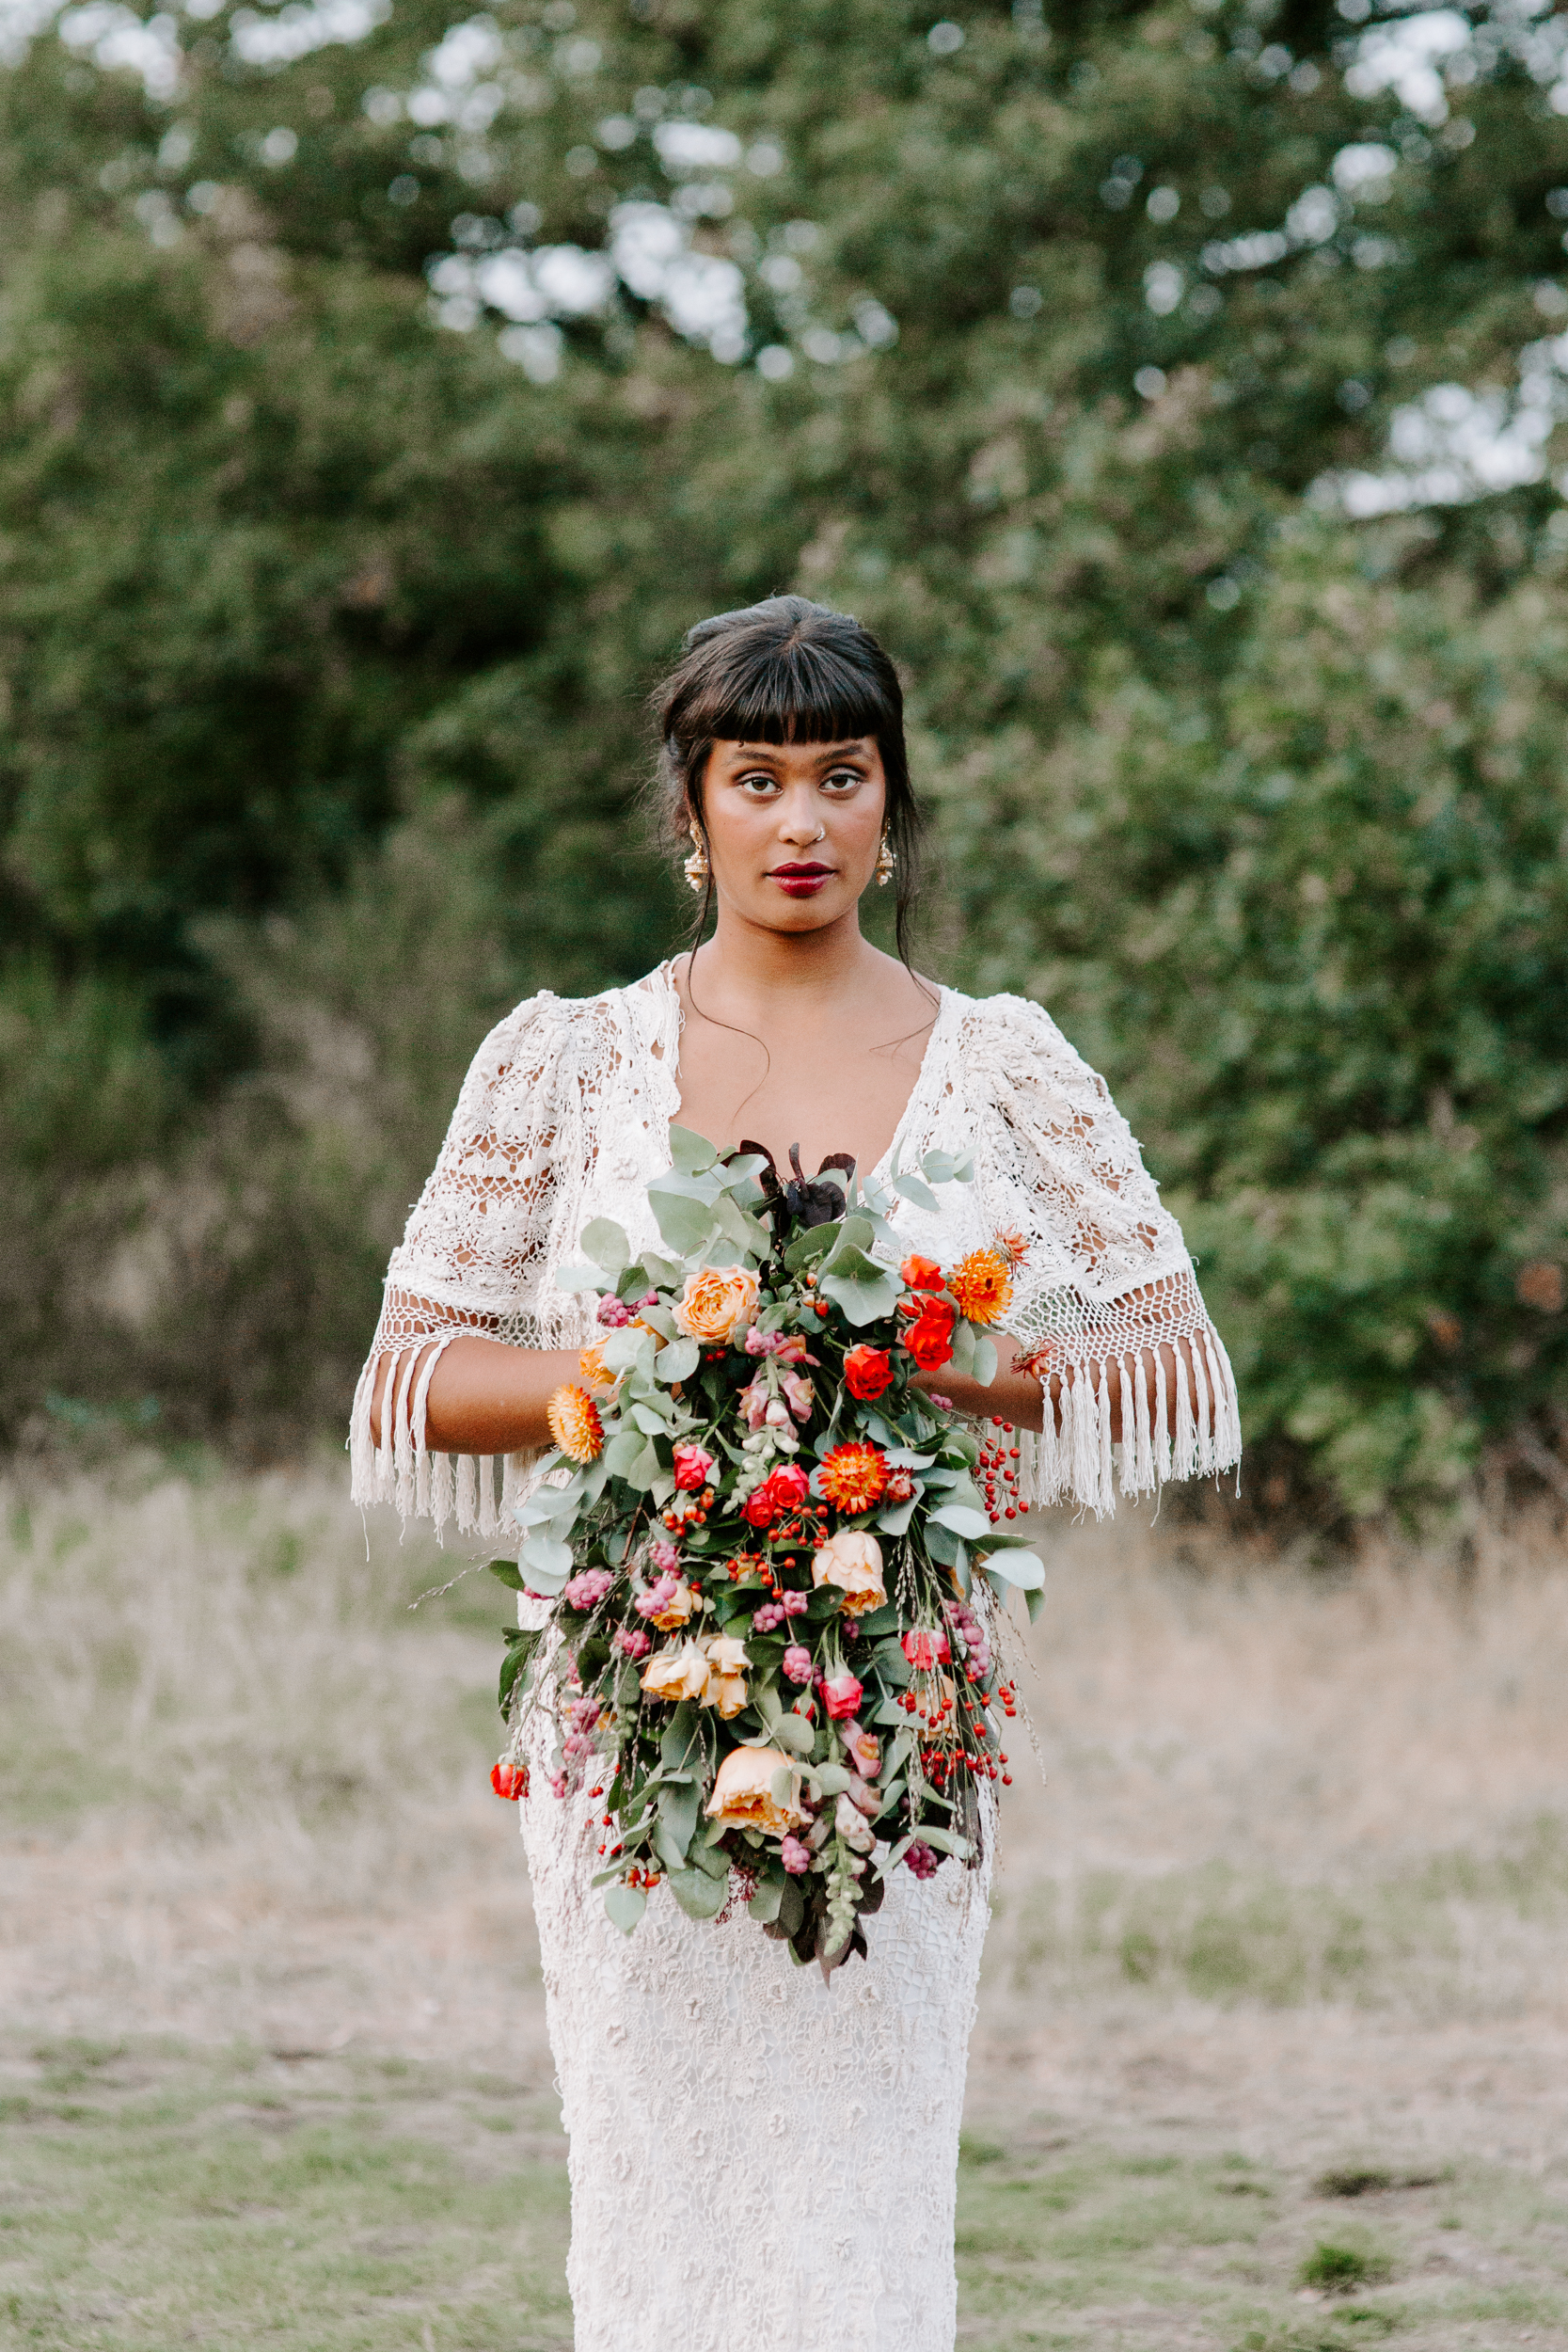 Epping wedding photographer